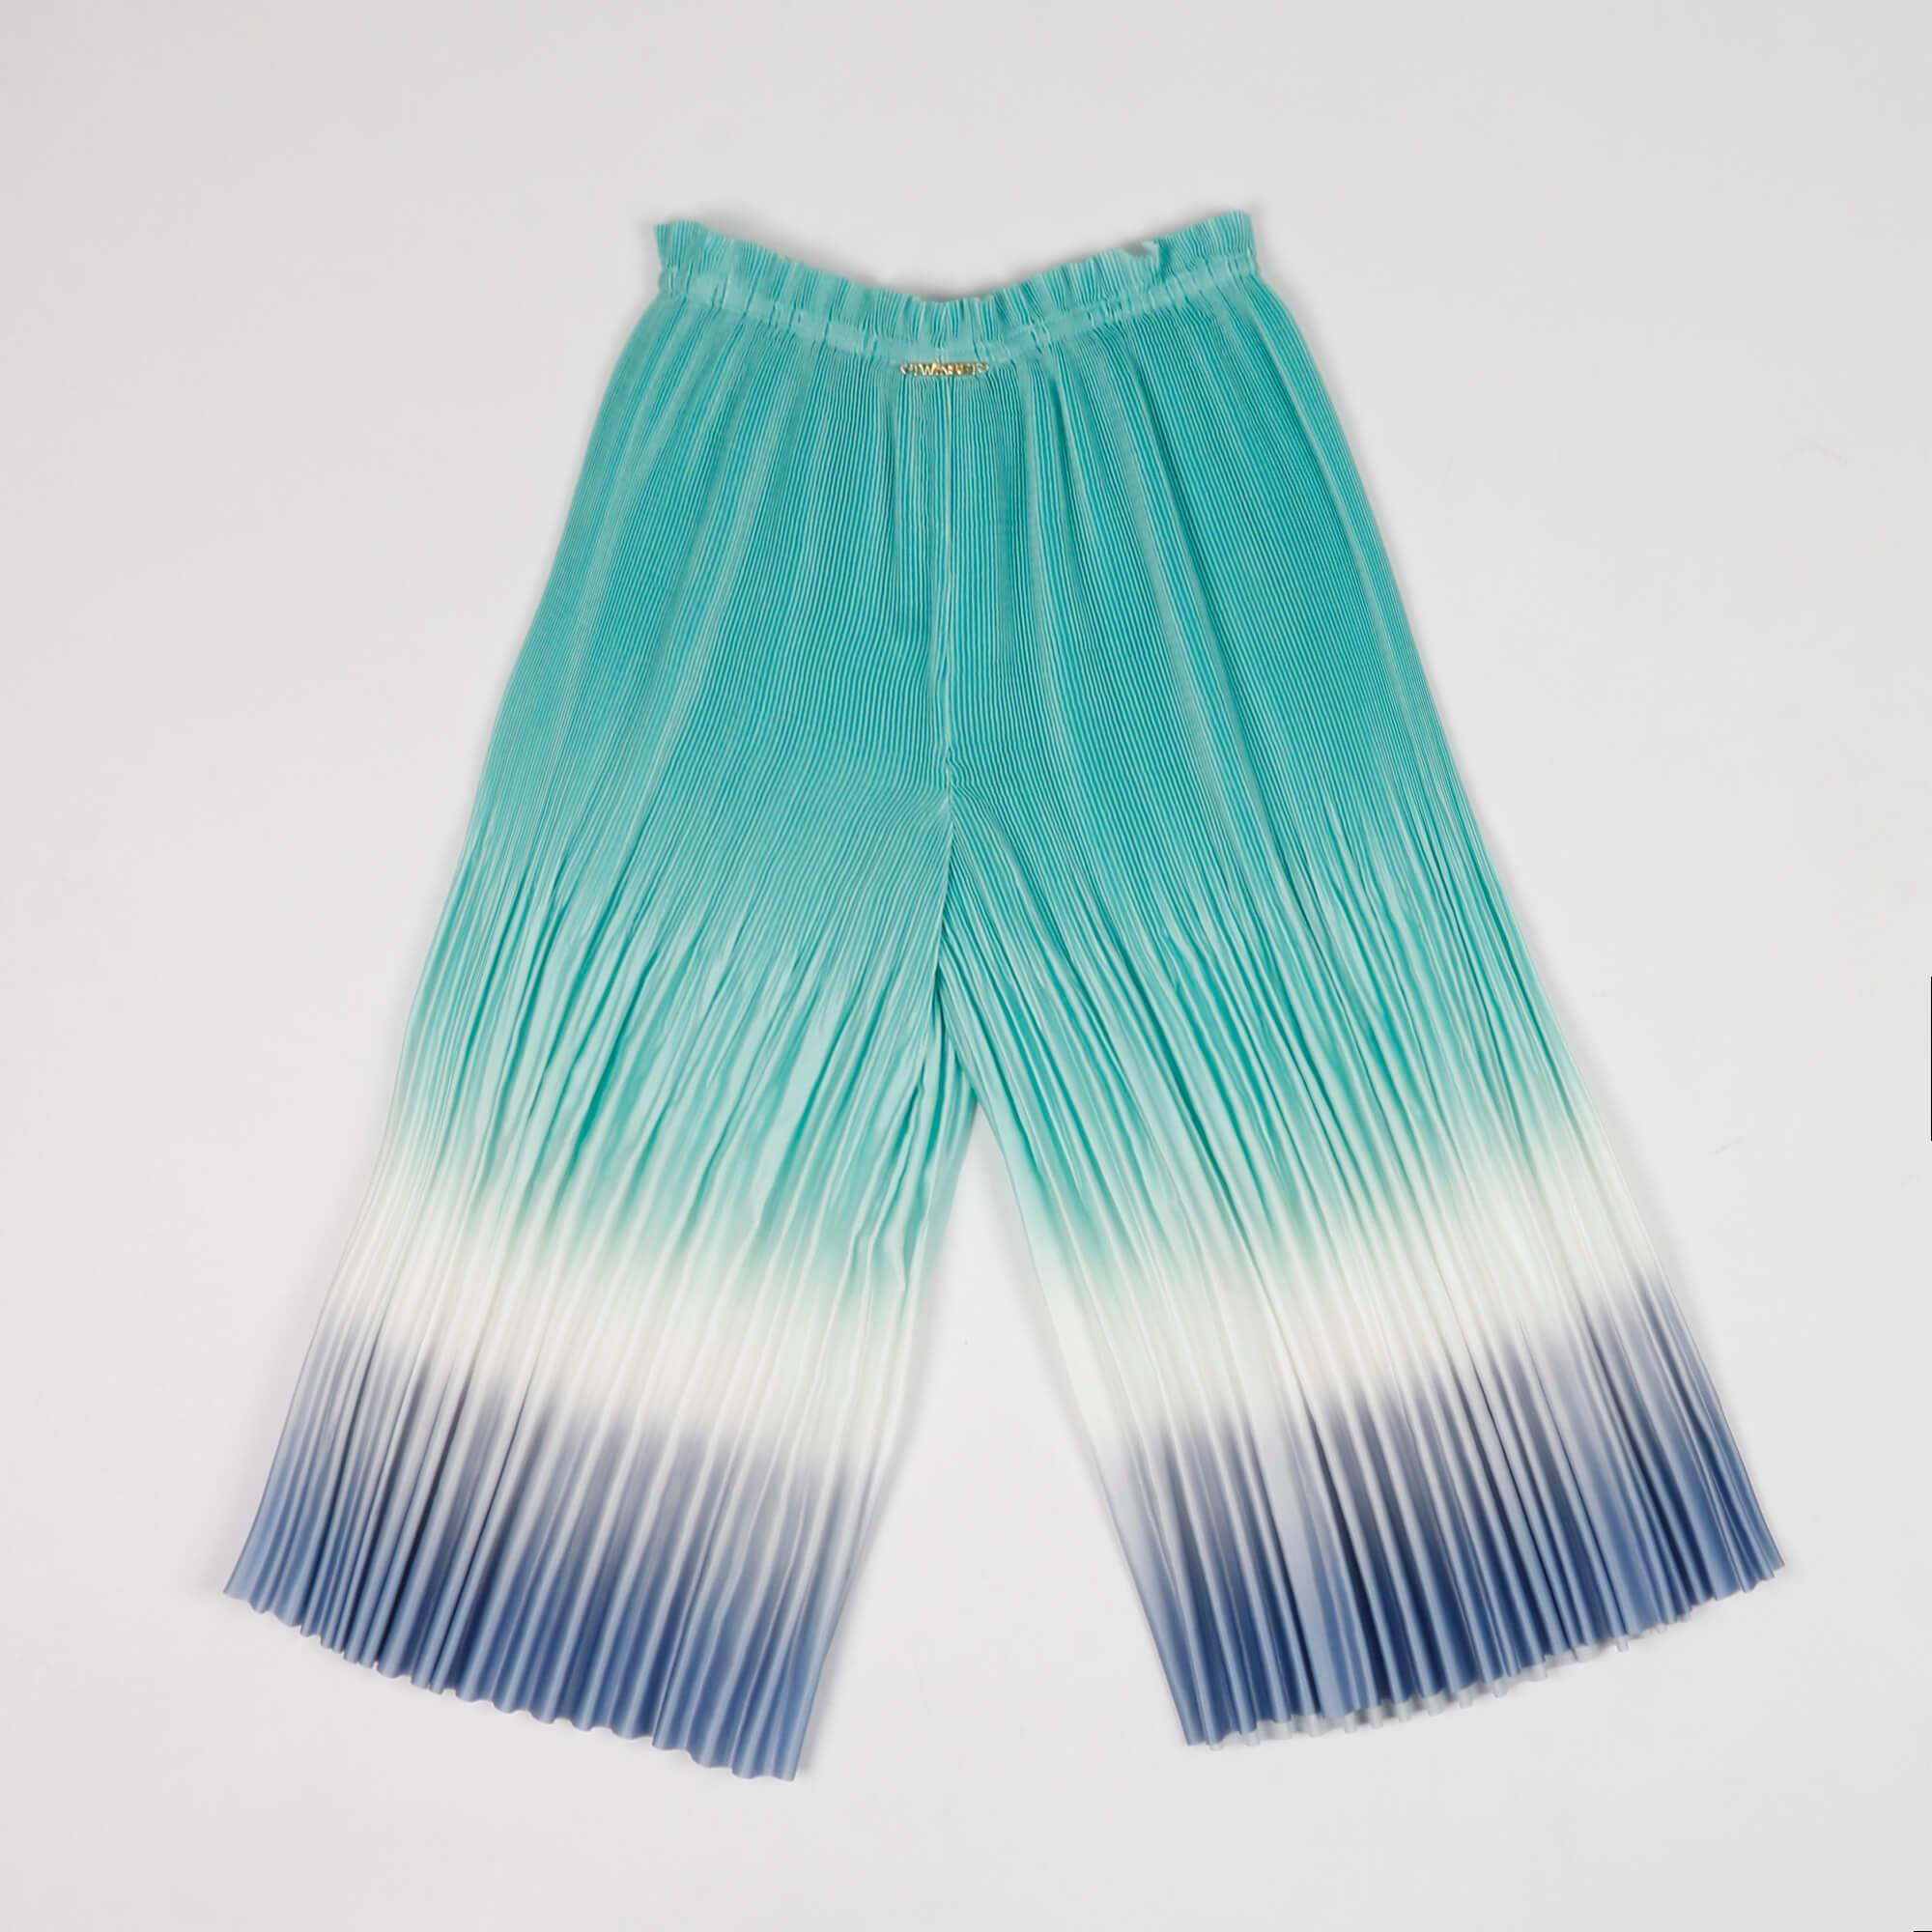 Pantalone in plissè sfumato - Celeste